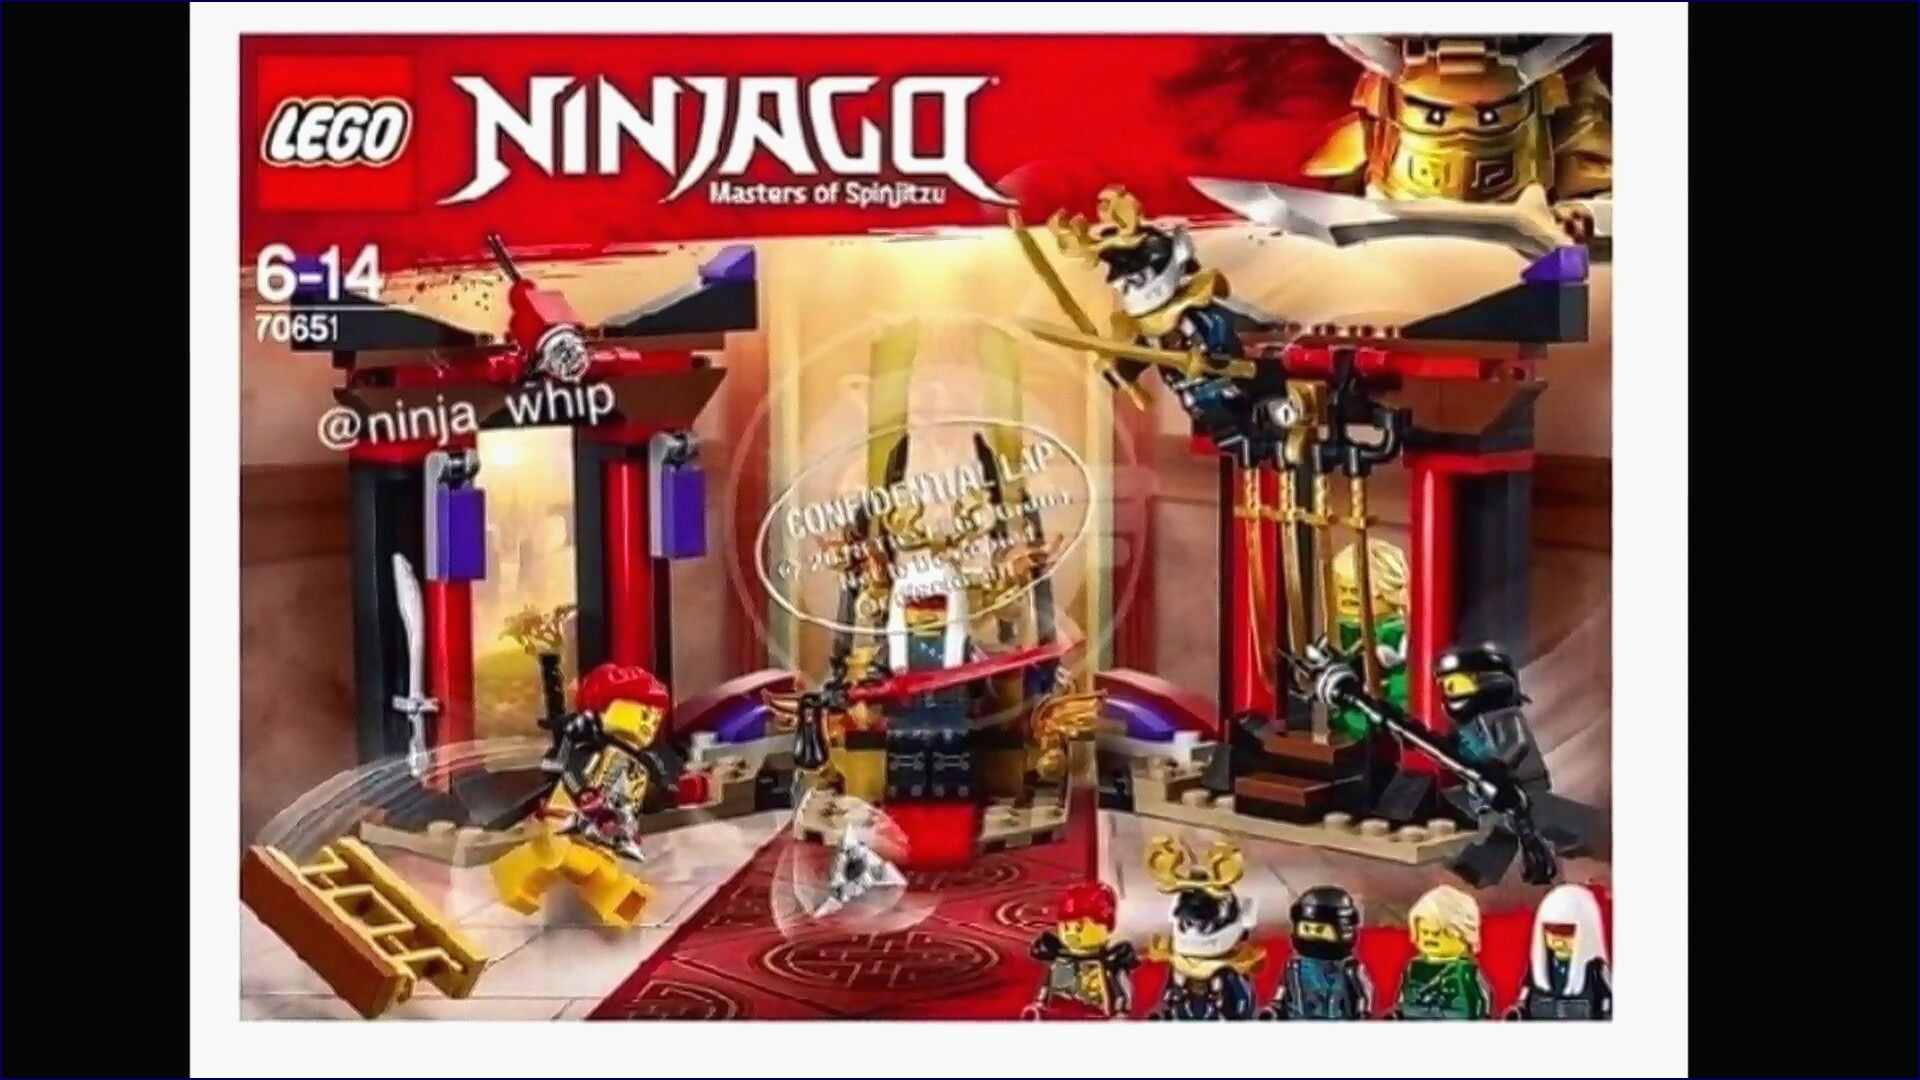 Ausmalbilder Ninjago Zane Inspirierend Titan Masters Elegant Bmw X3 2 0d 38b64a05 S – the Best Sport Bild